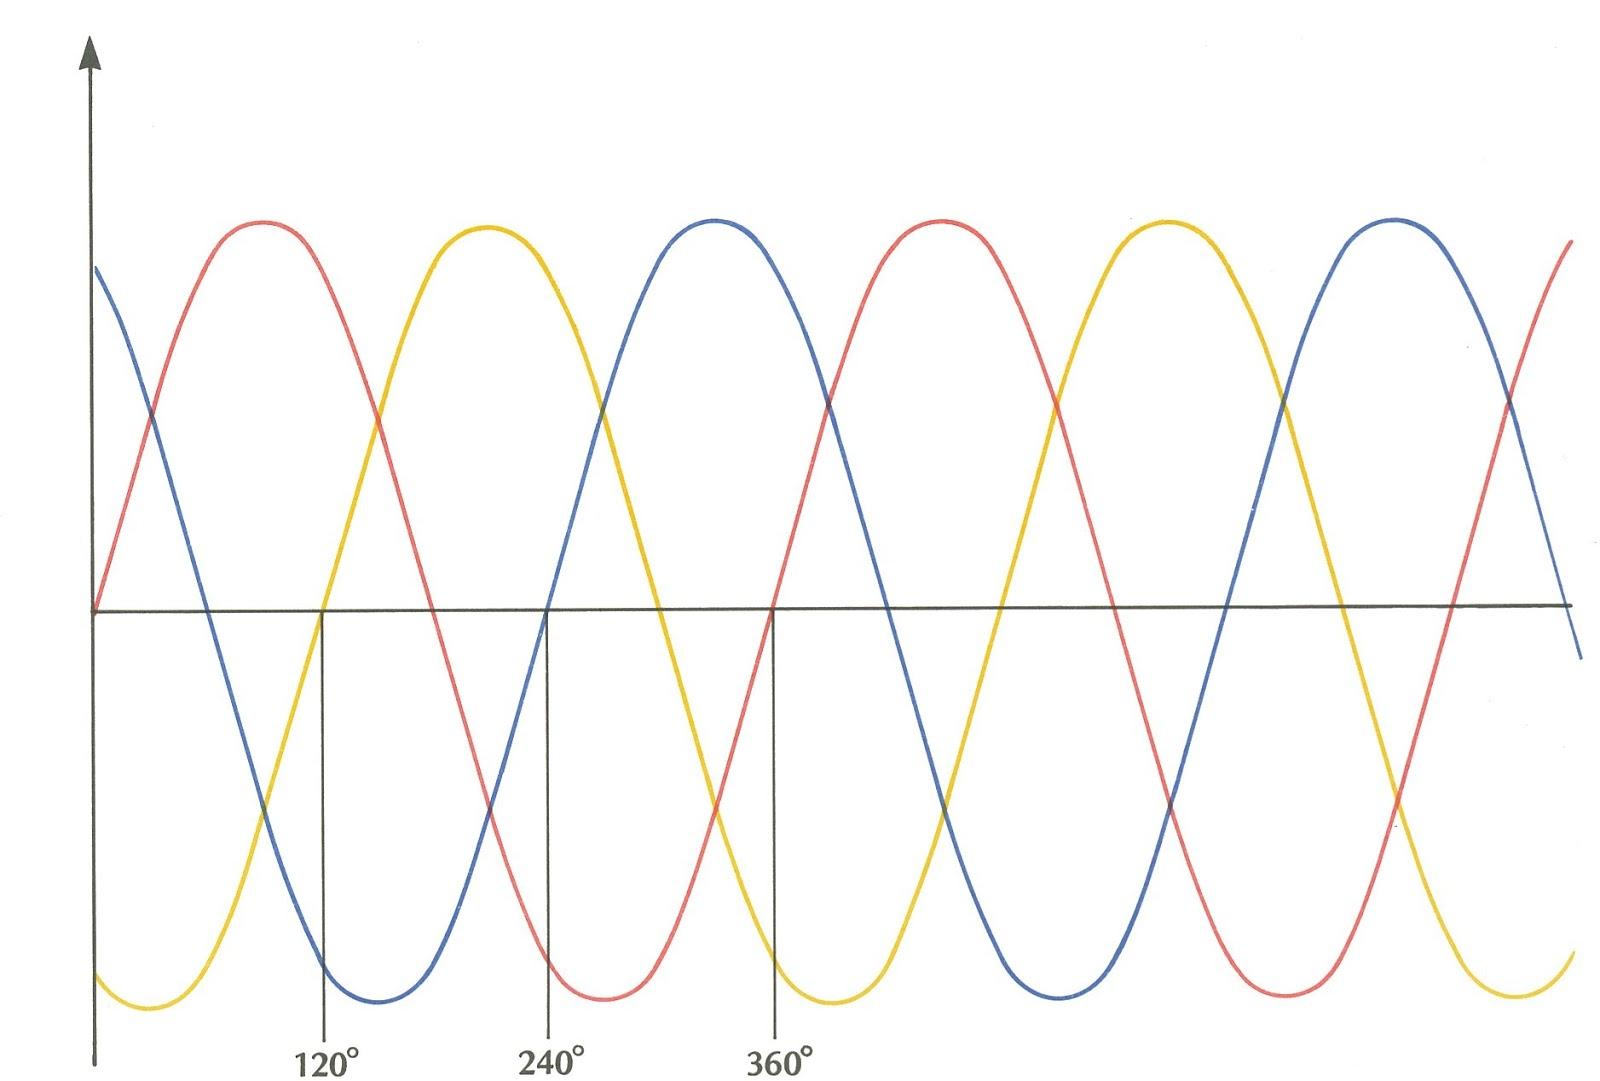 allis chalmers ca wiring diagram images allis chalmers b c ca allis chalmers wiring schematic nilza b c ca